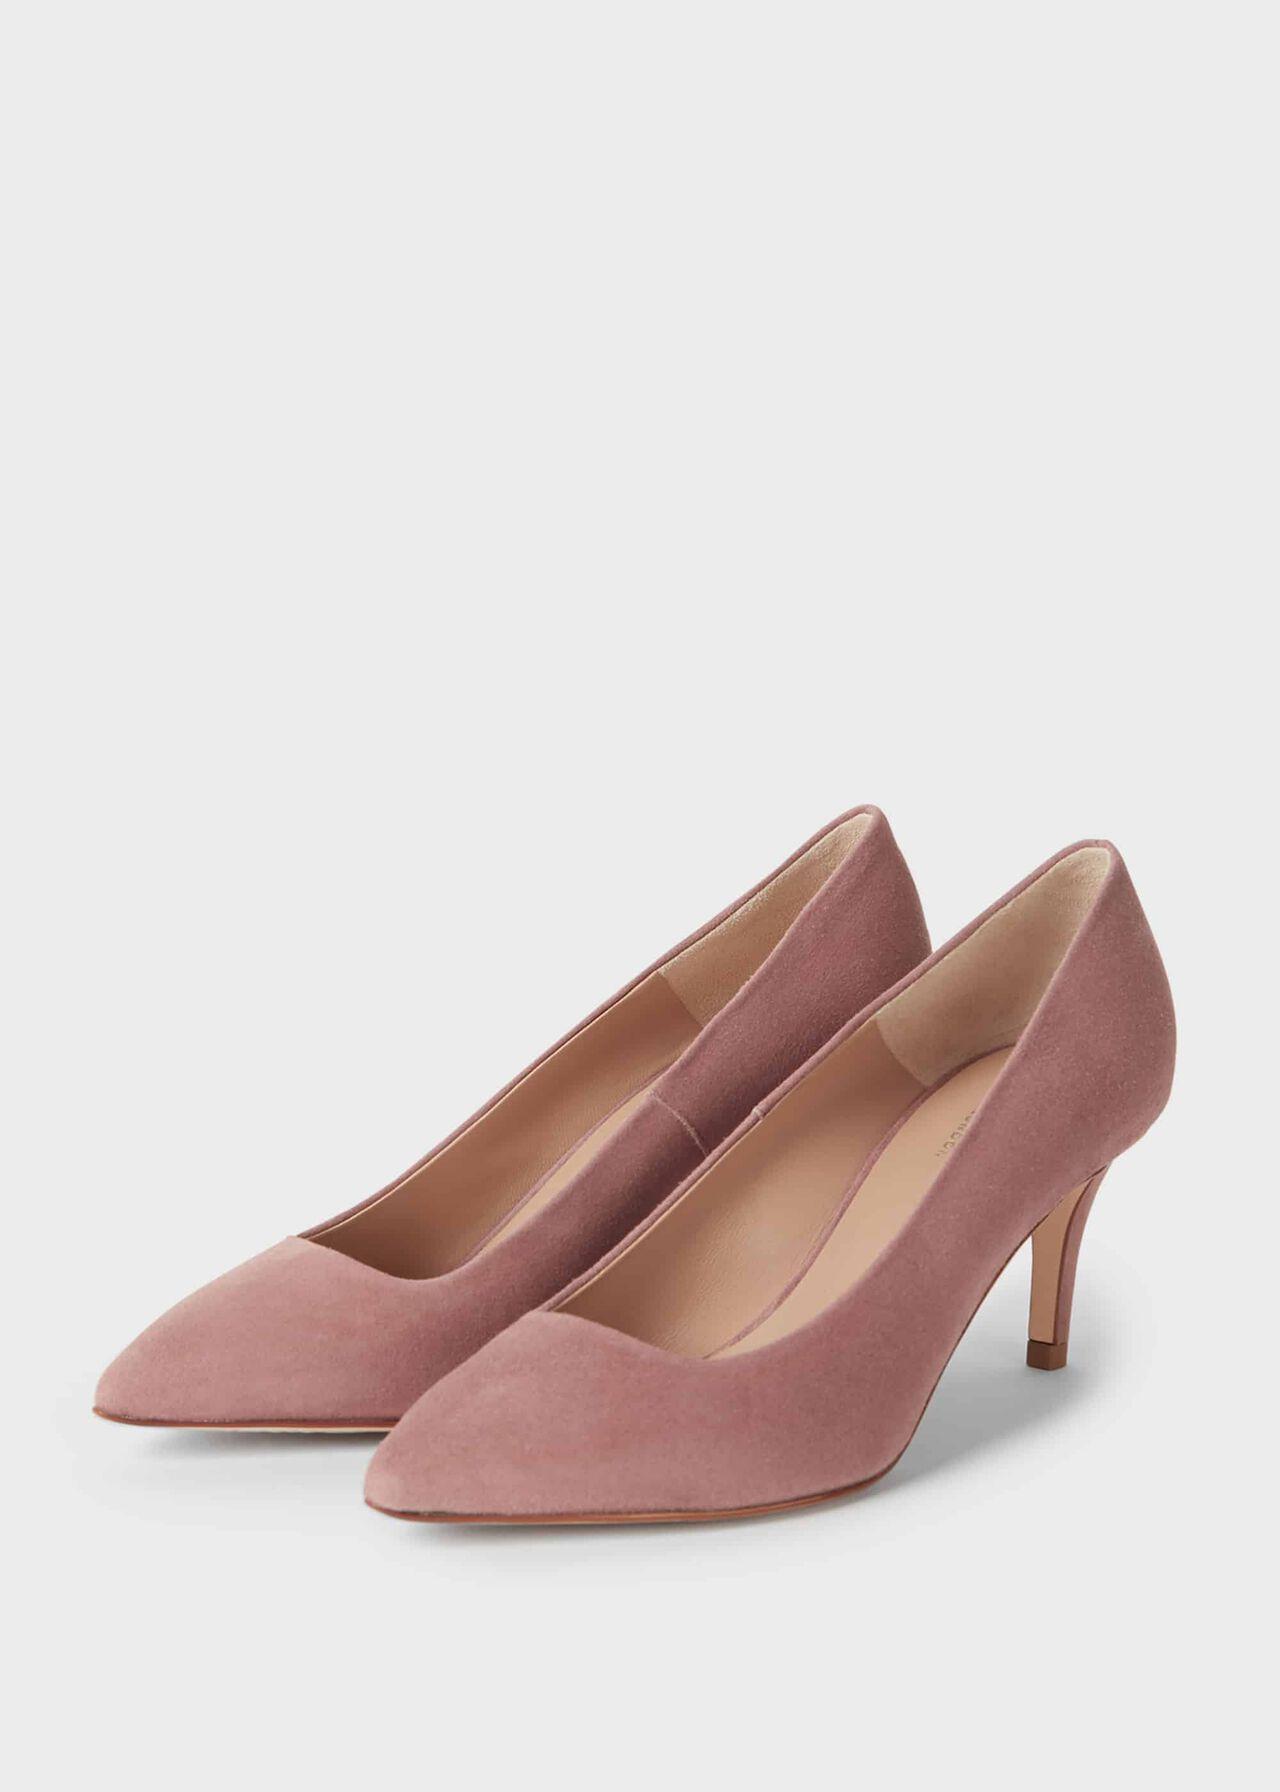 Elouise Suede Stiletto Court Shoes Dusky Pink